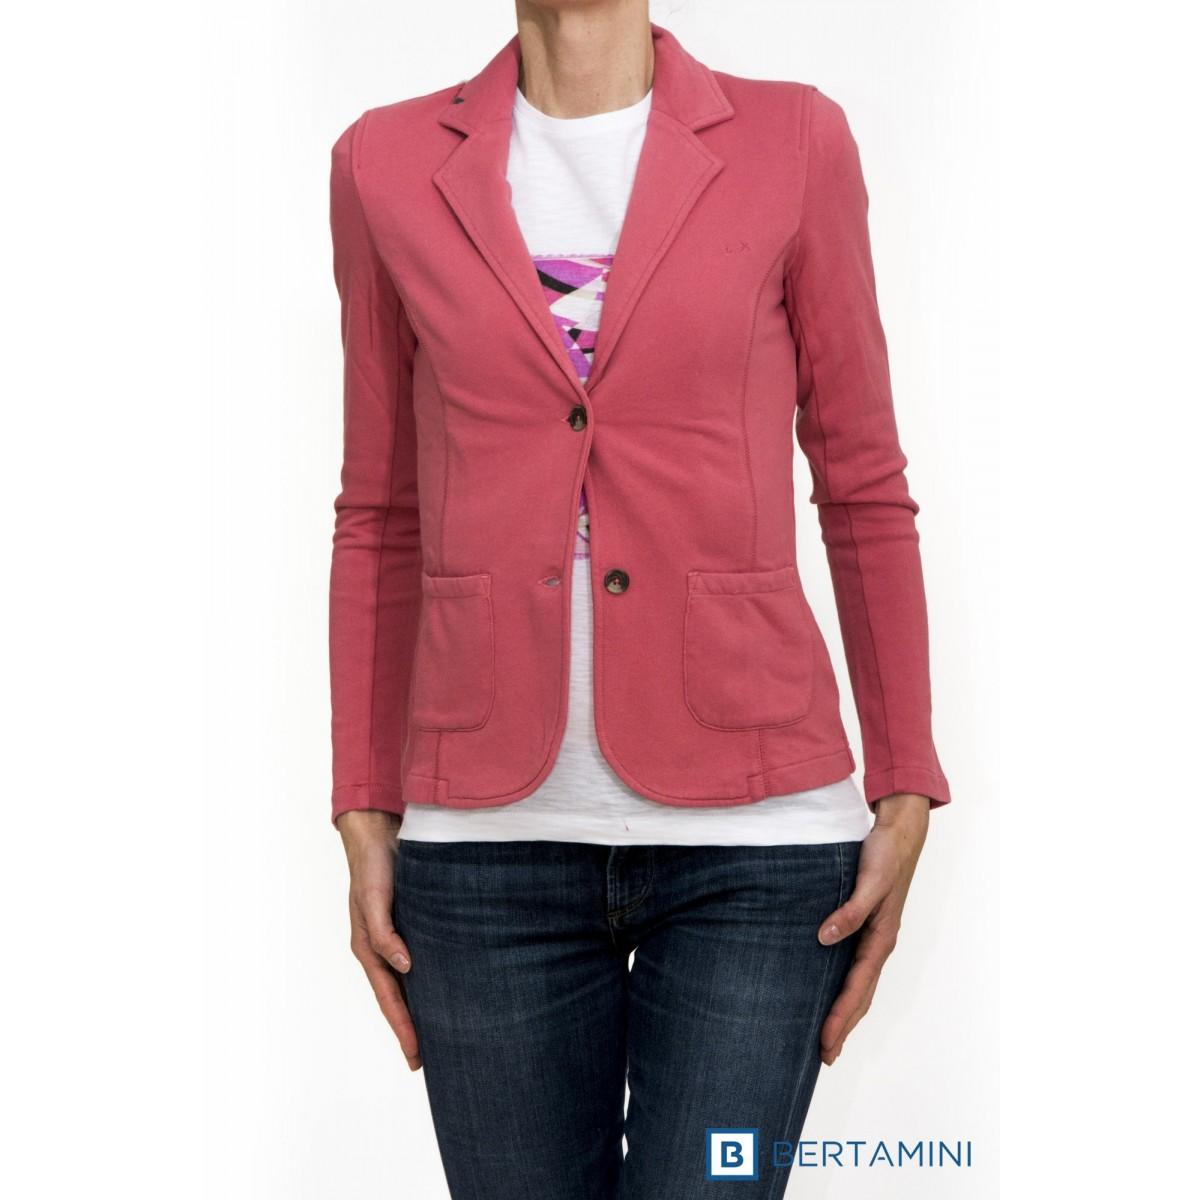 Giacca donna Sun 68 - 16234 giacchina 2 bottoni